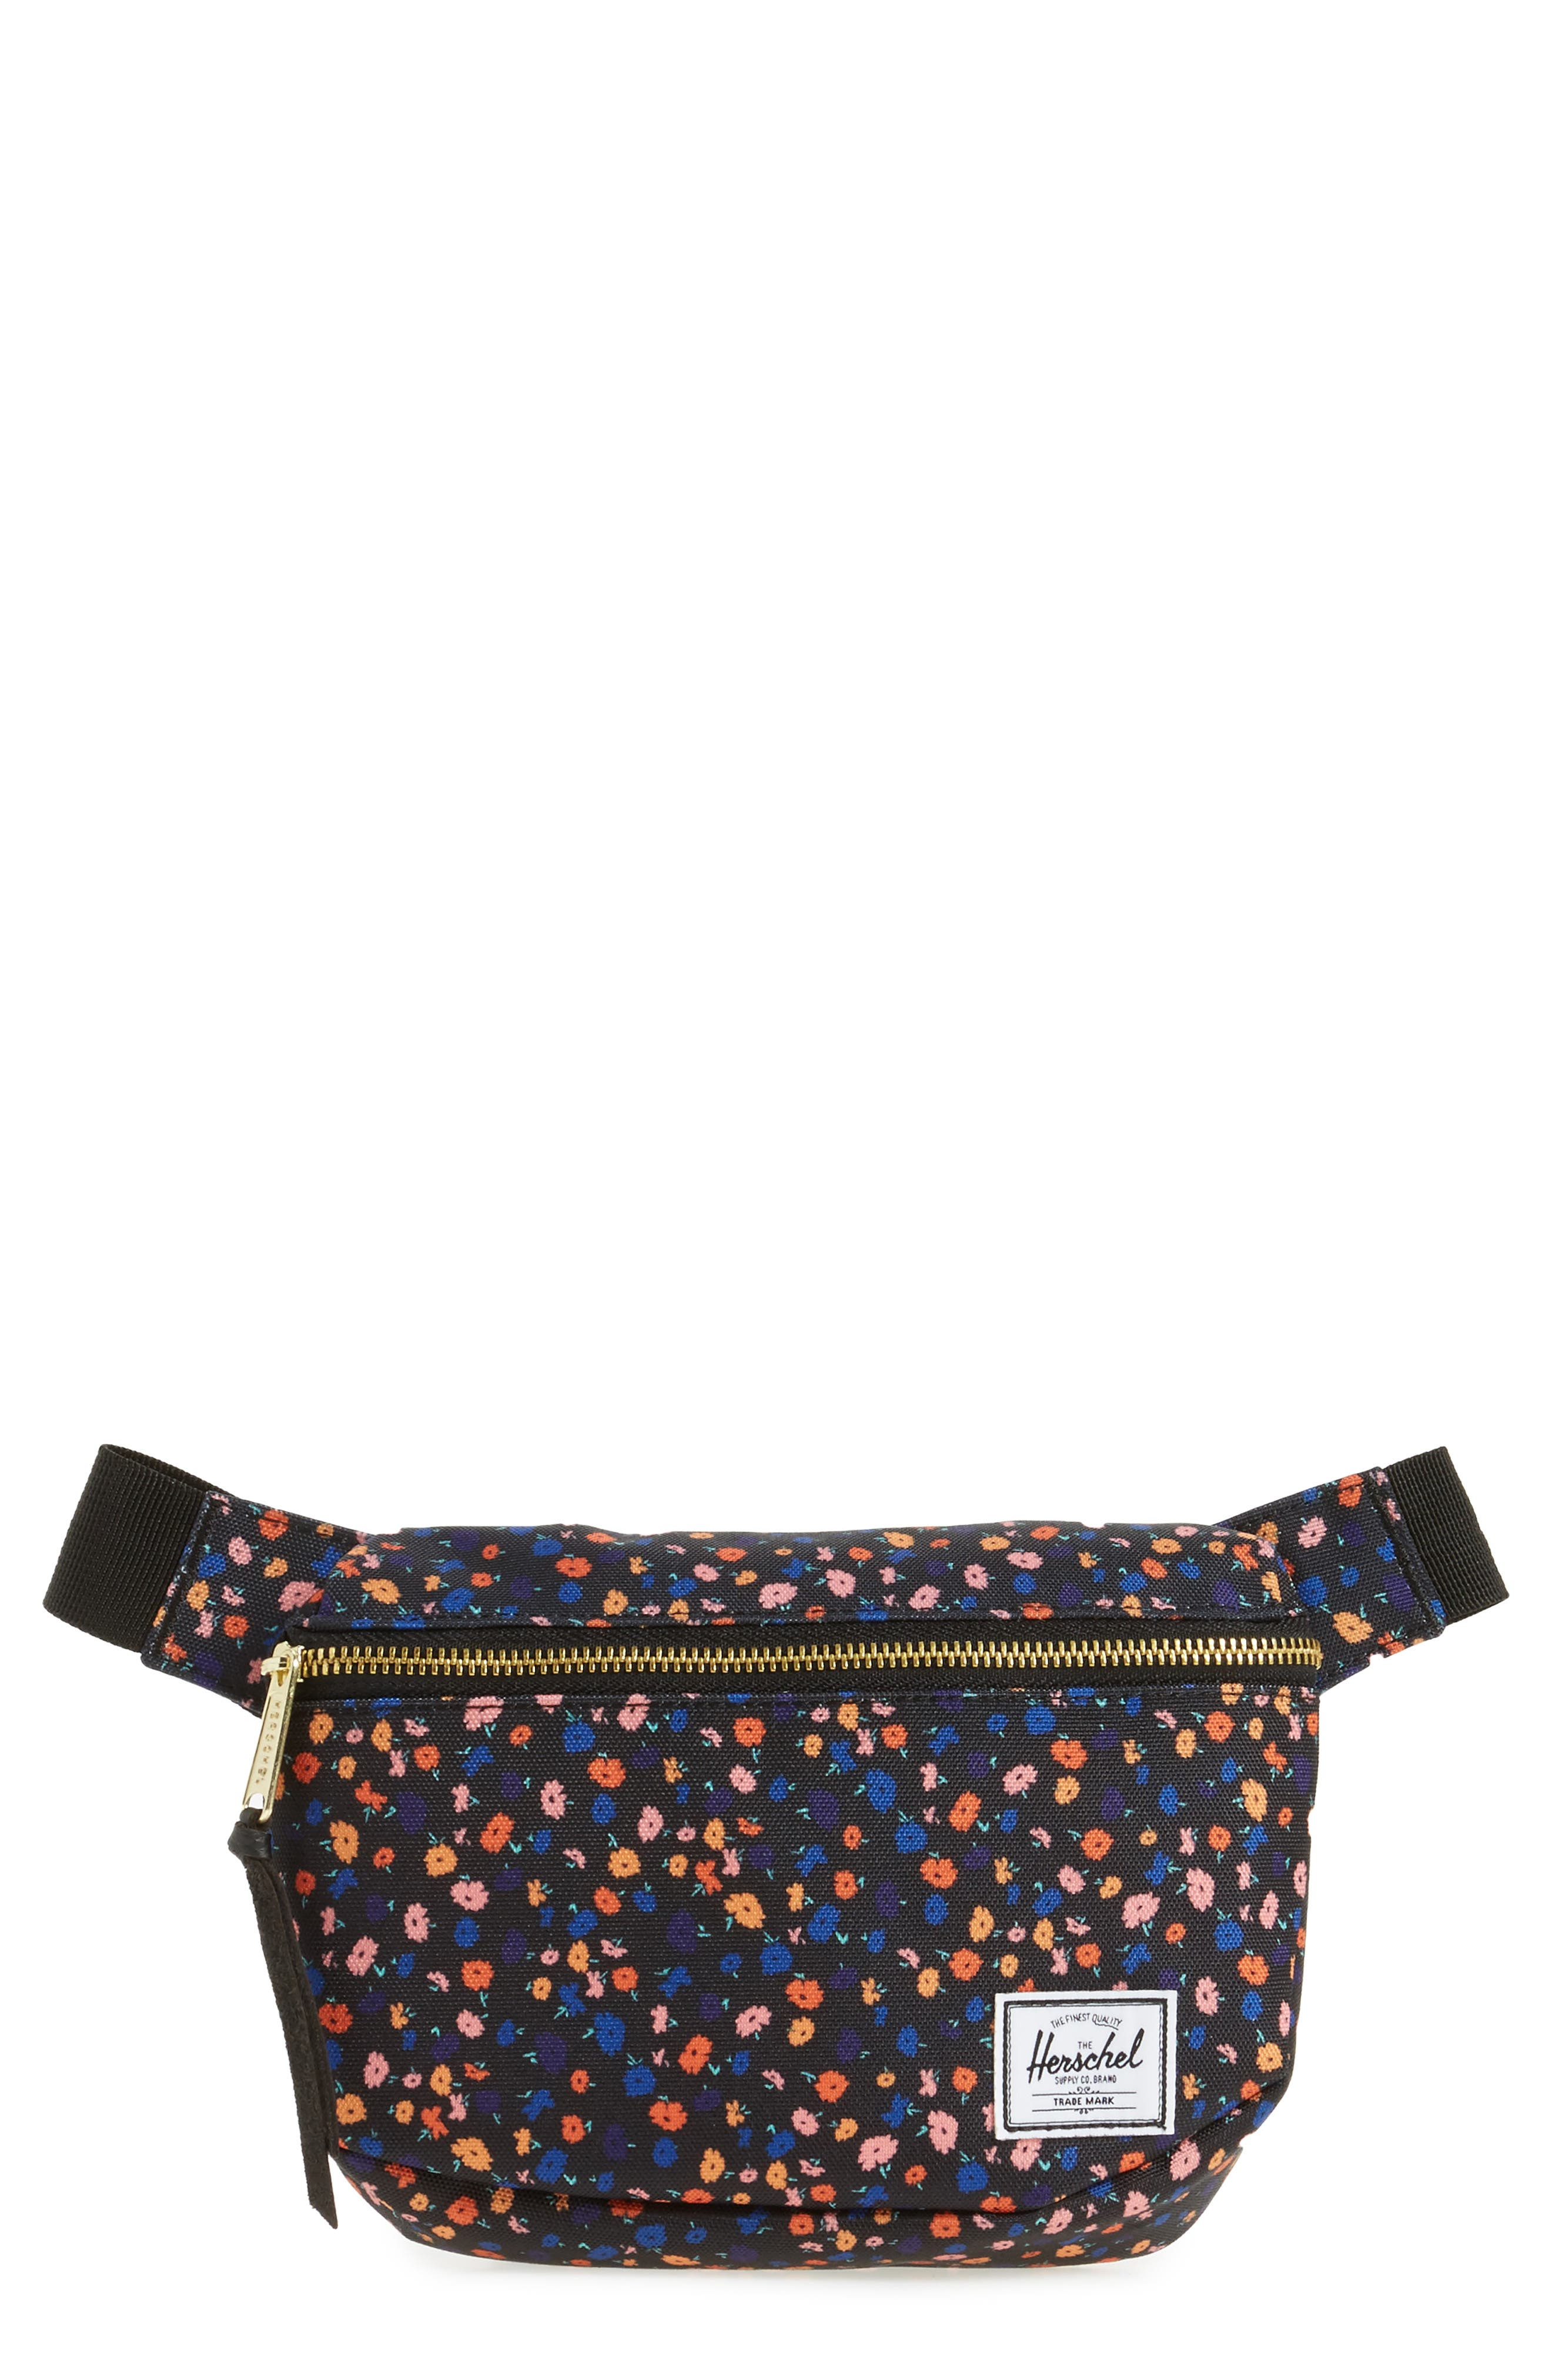 Fifteen Belt Bag,                         Main,                         color, BLACK MINI FLORAL